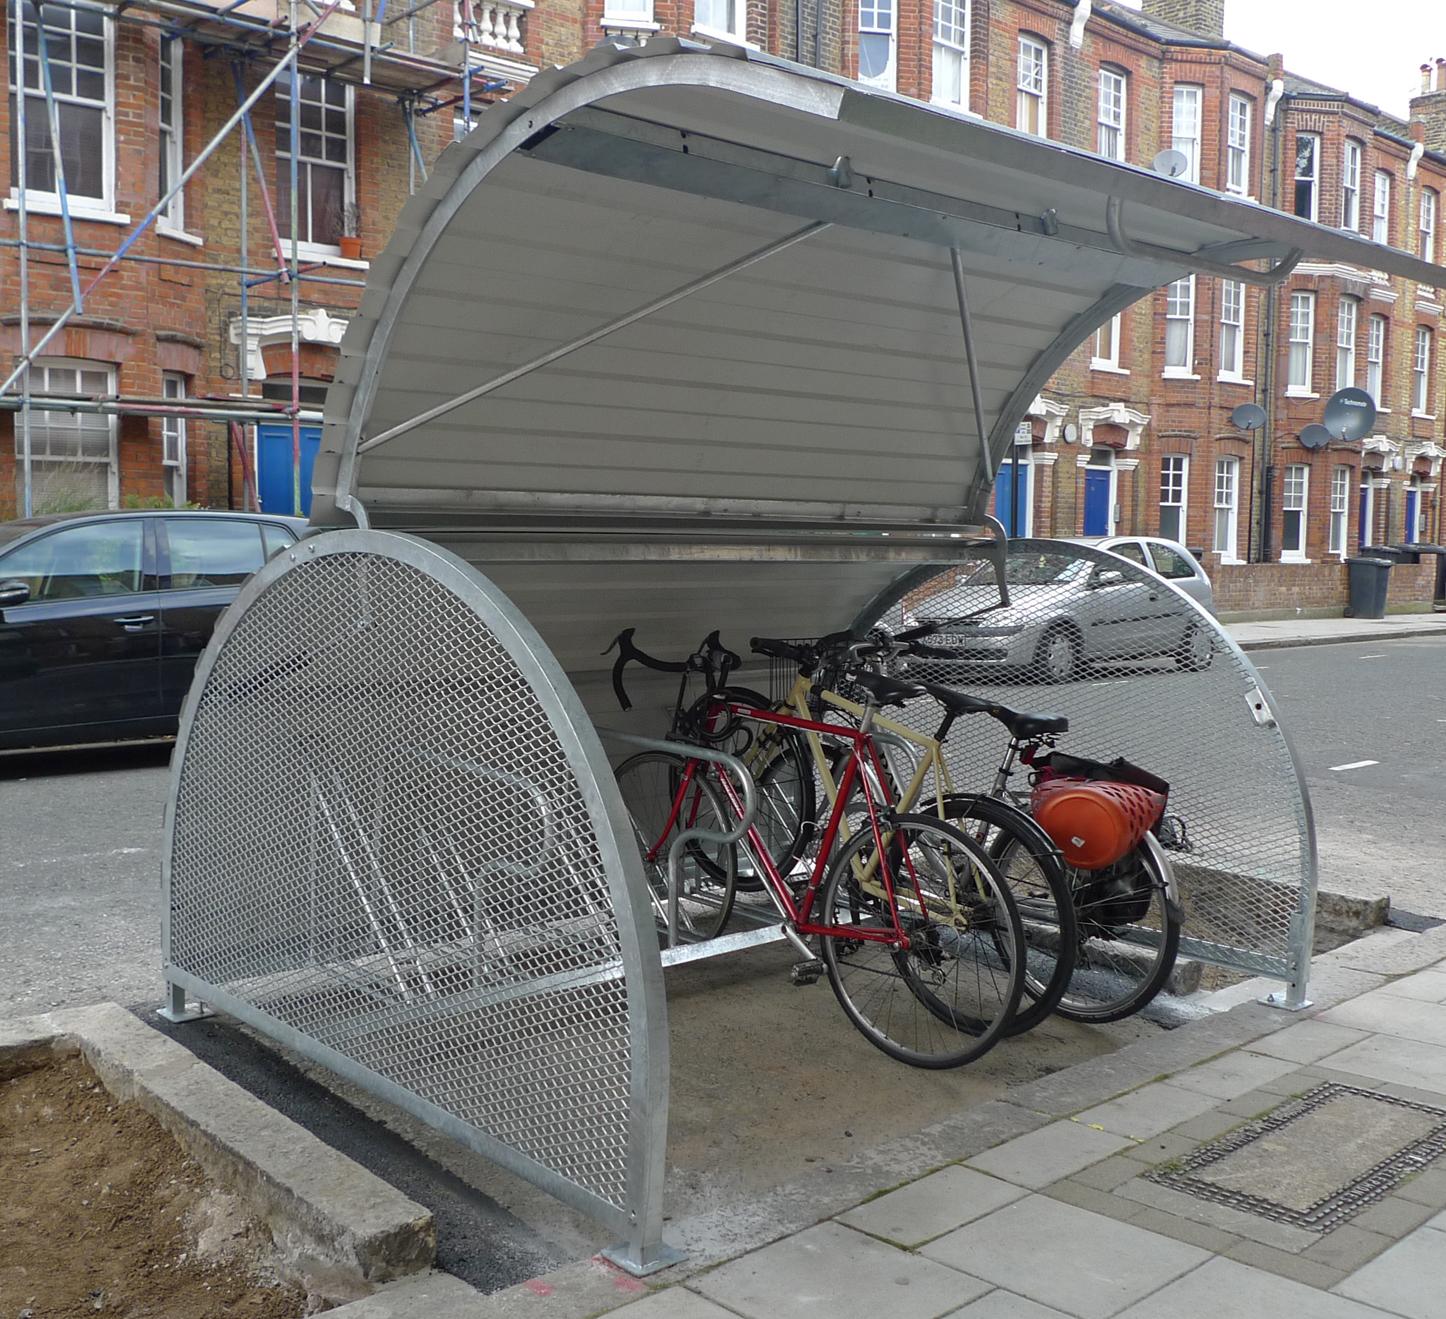 Bikehangar-6bikes-MoratSt2